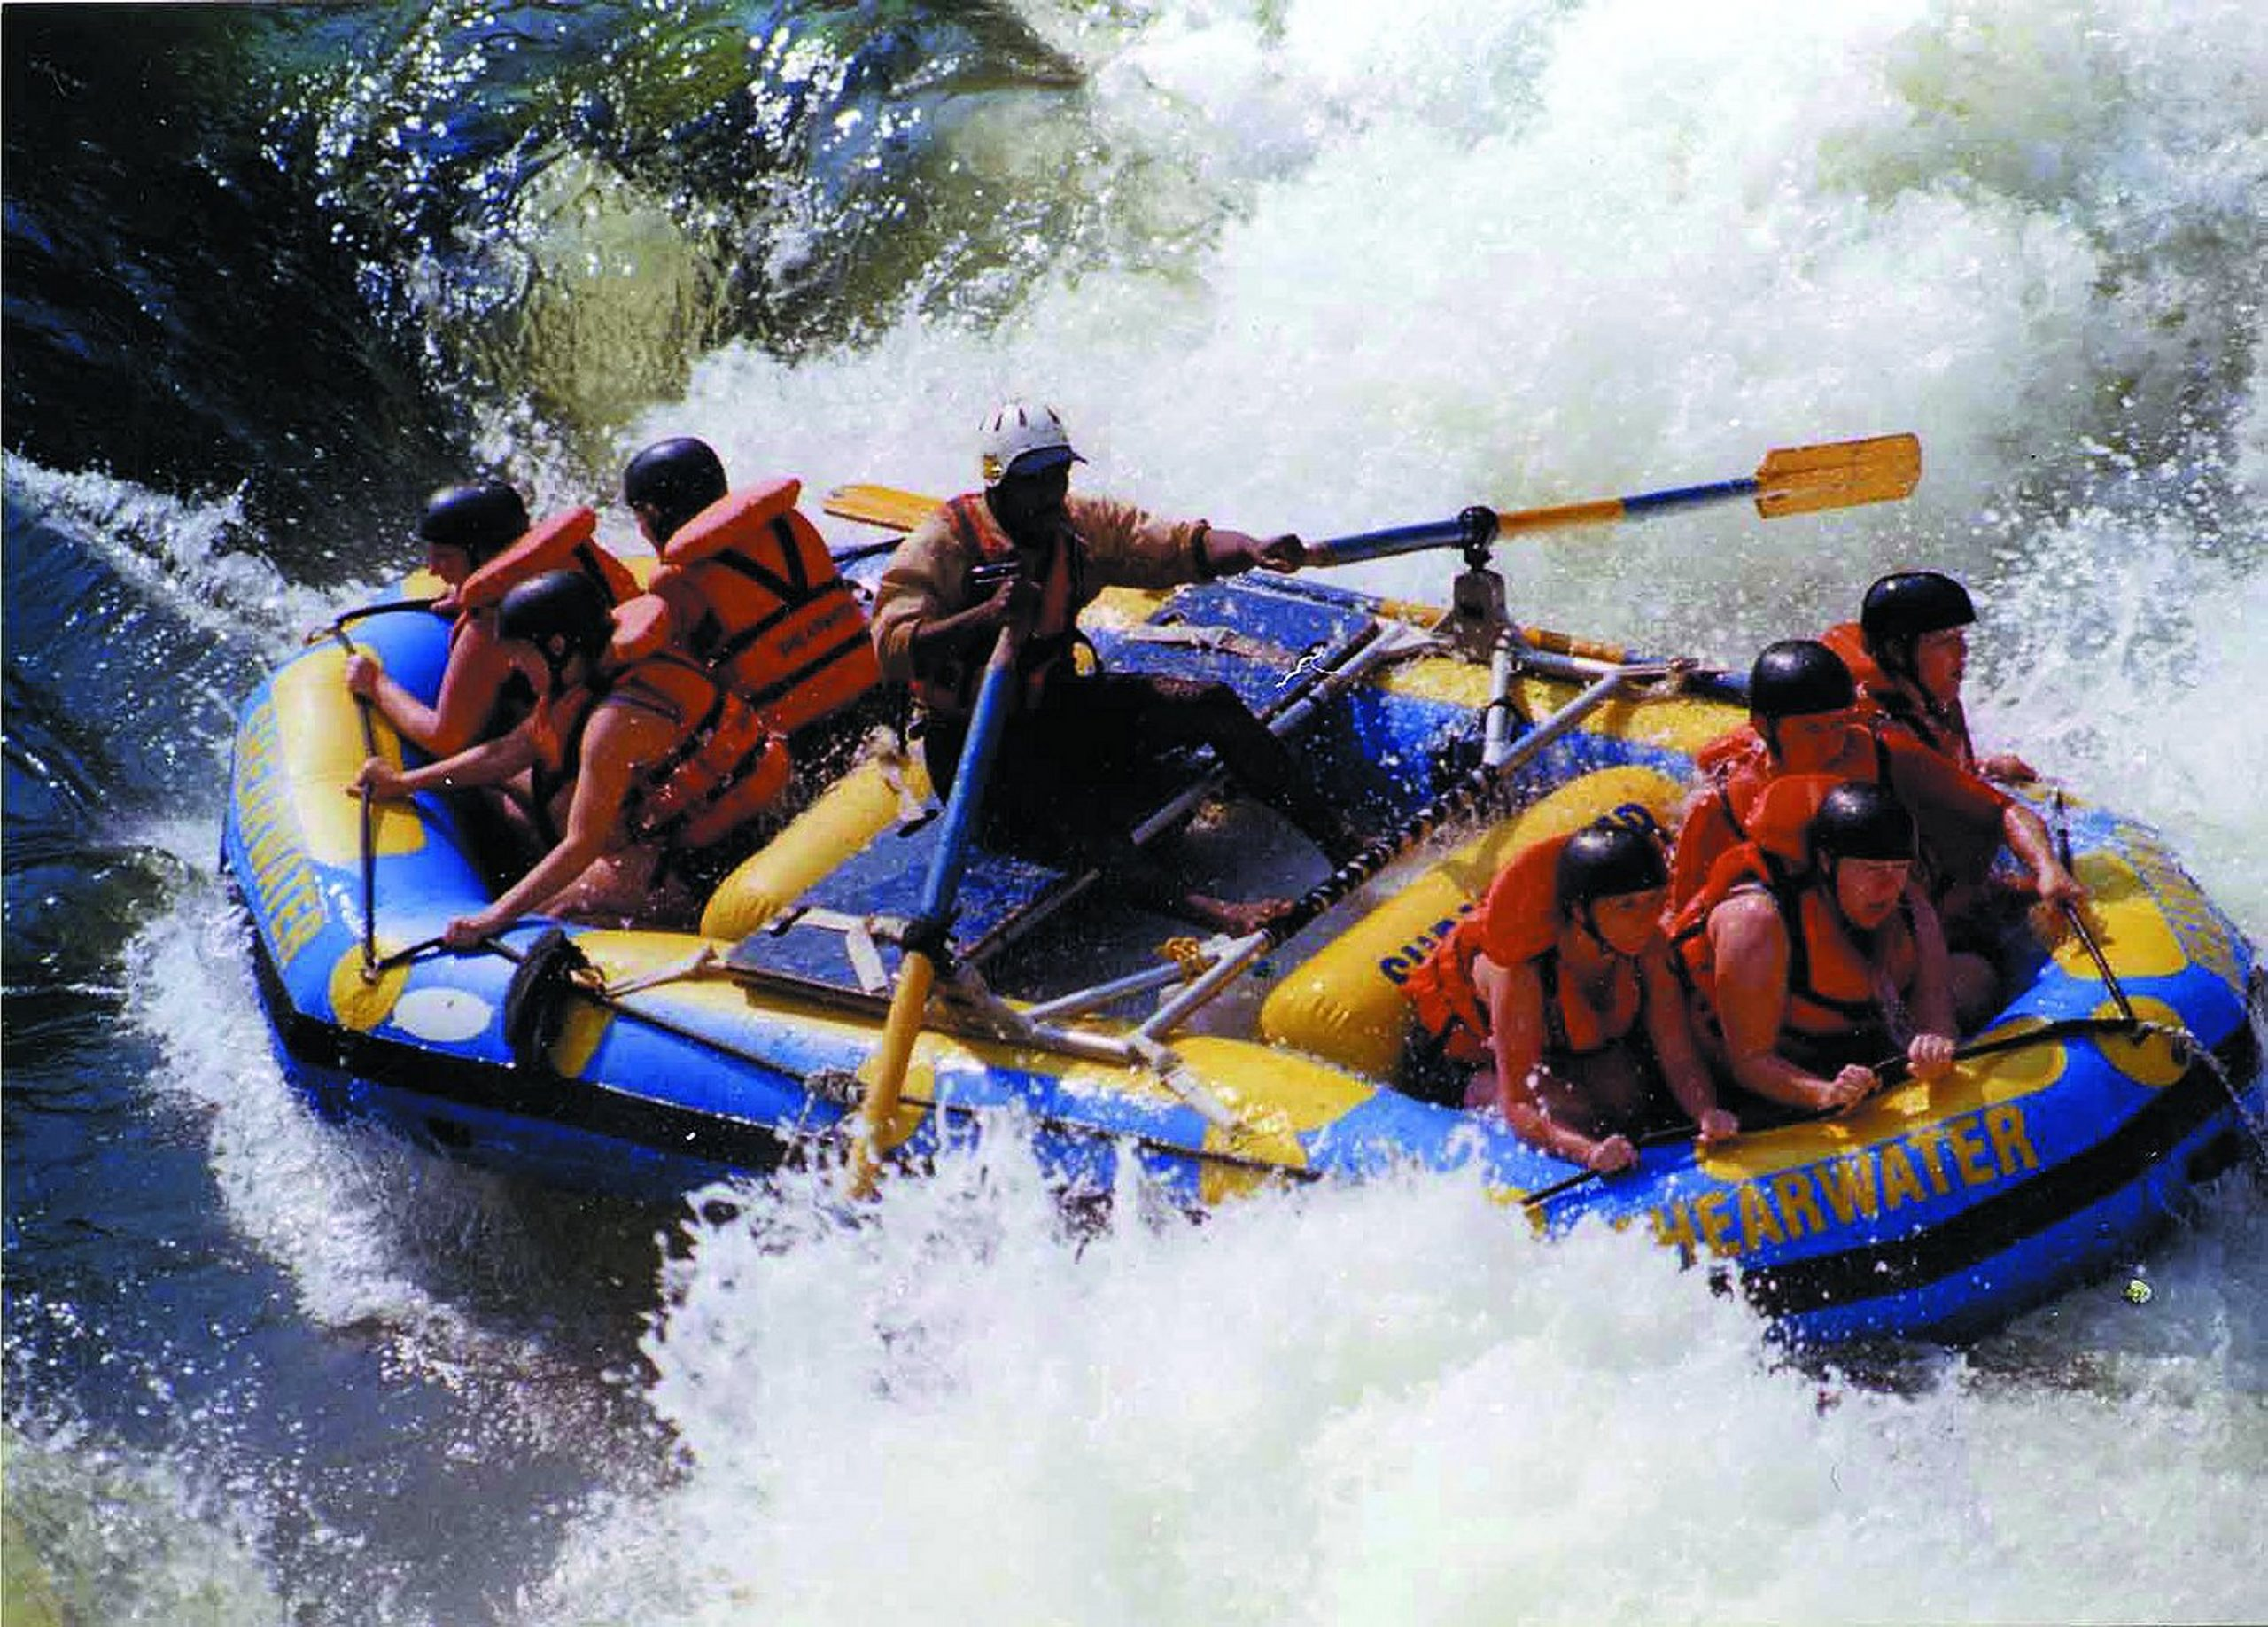 rafting in Victoria Falls